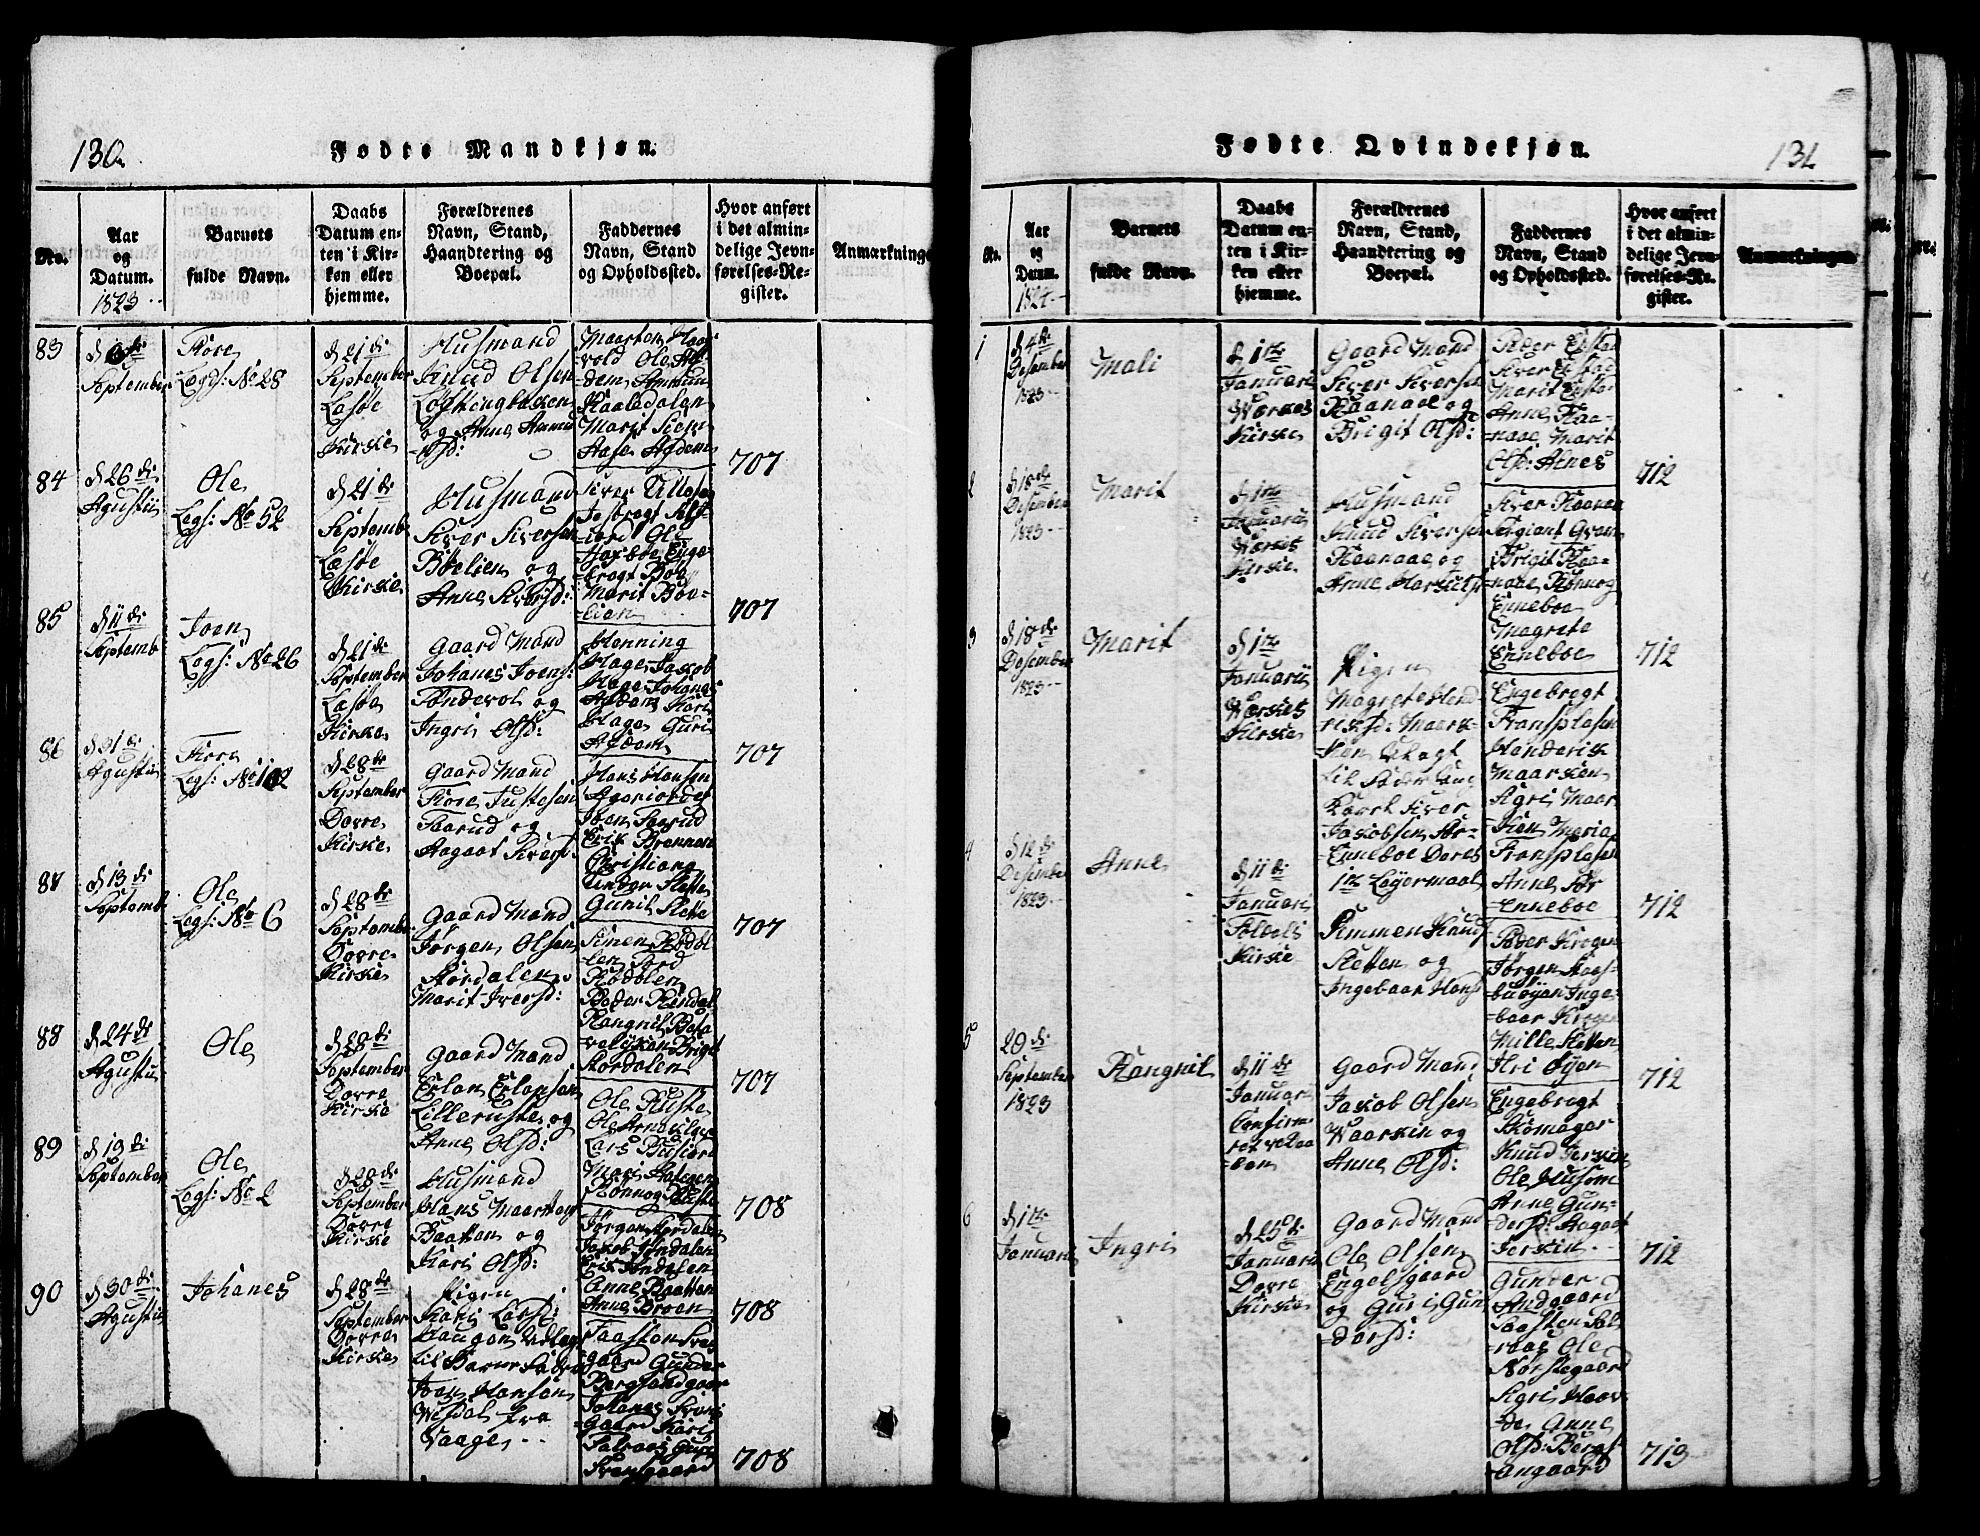 SAH, Lesja prestekontor, Klokkerbok nr. 1, 1820-1831, s. 130-131